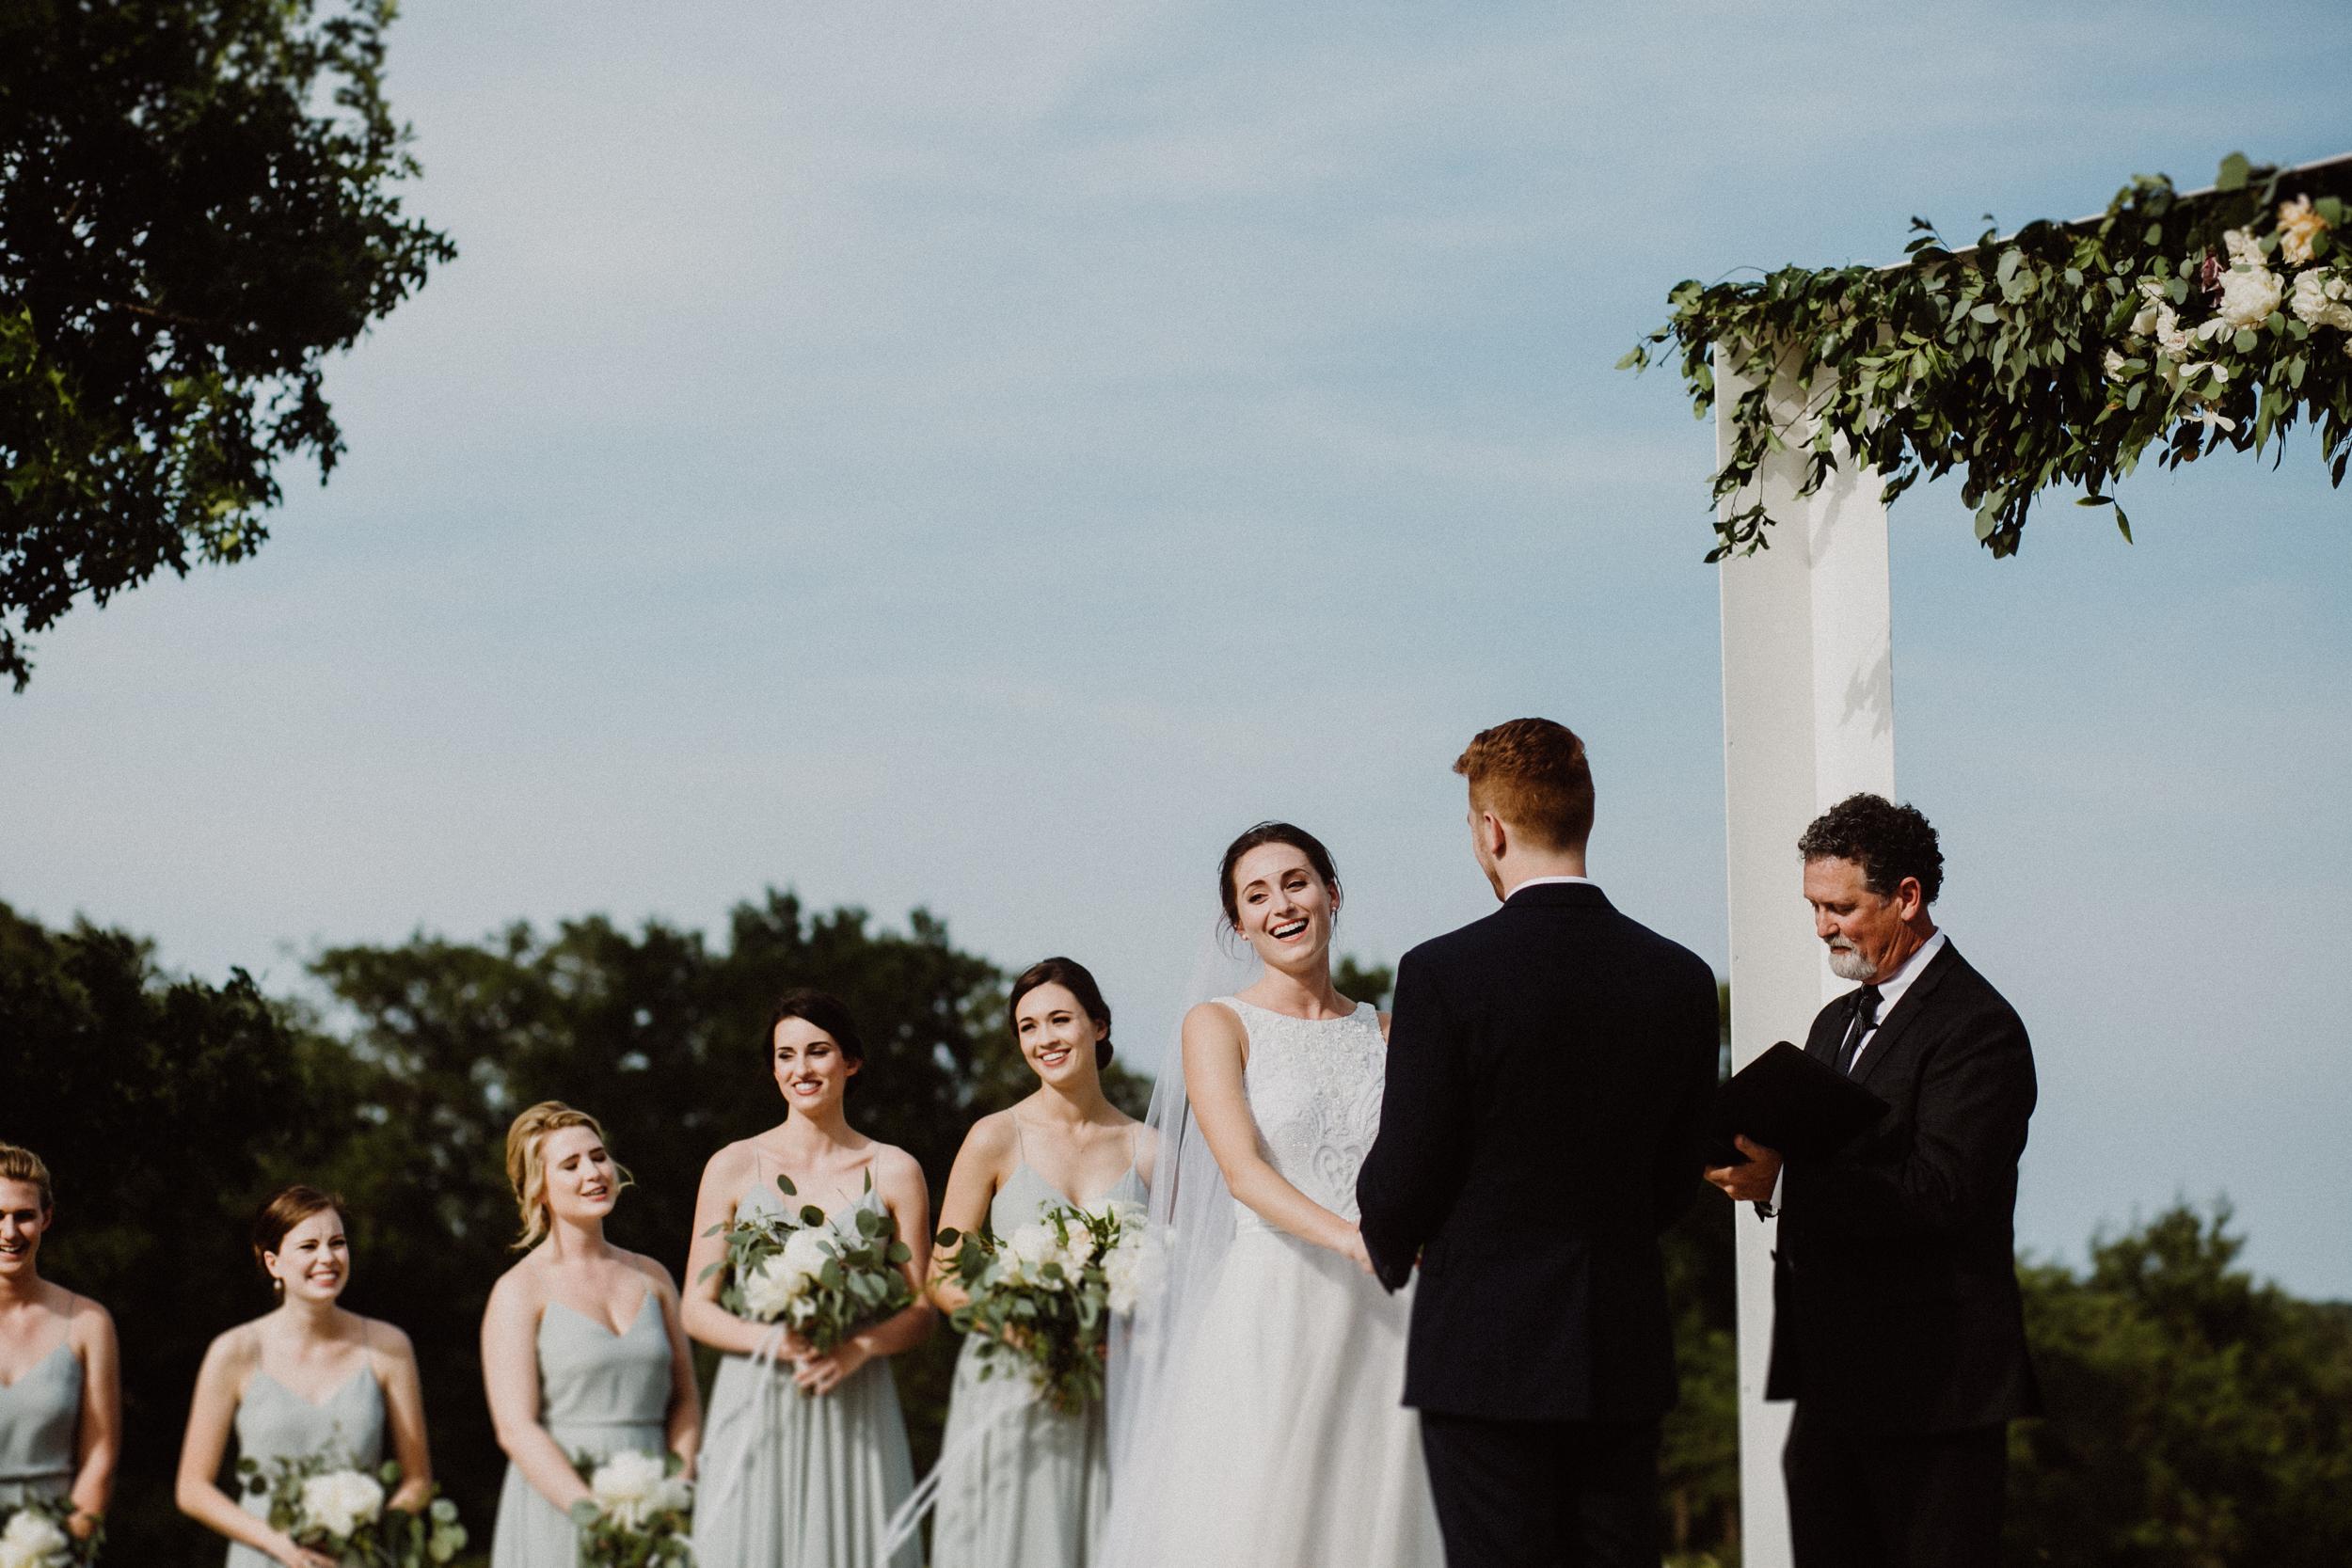 prospect-house-wedding-S&AC-544.jpg